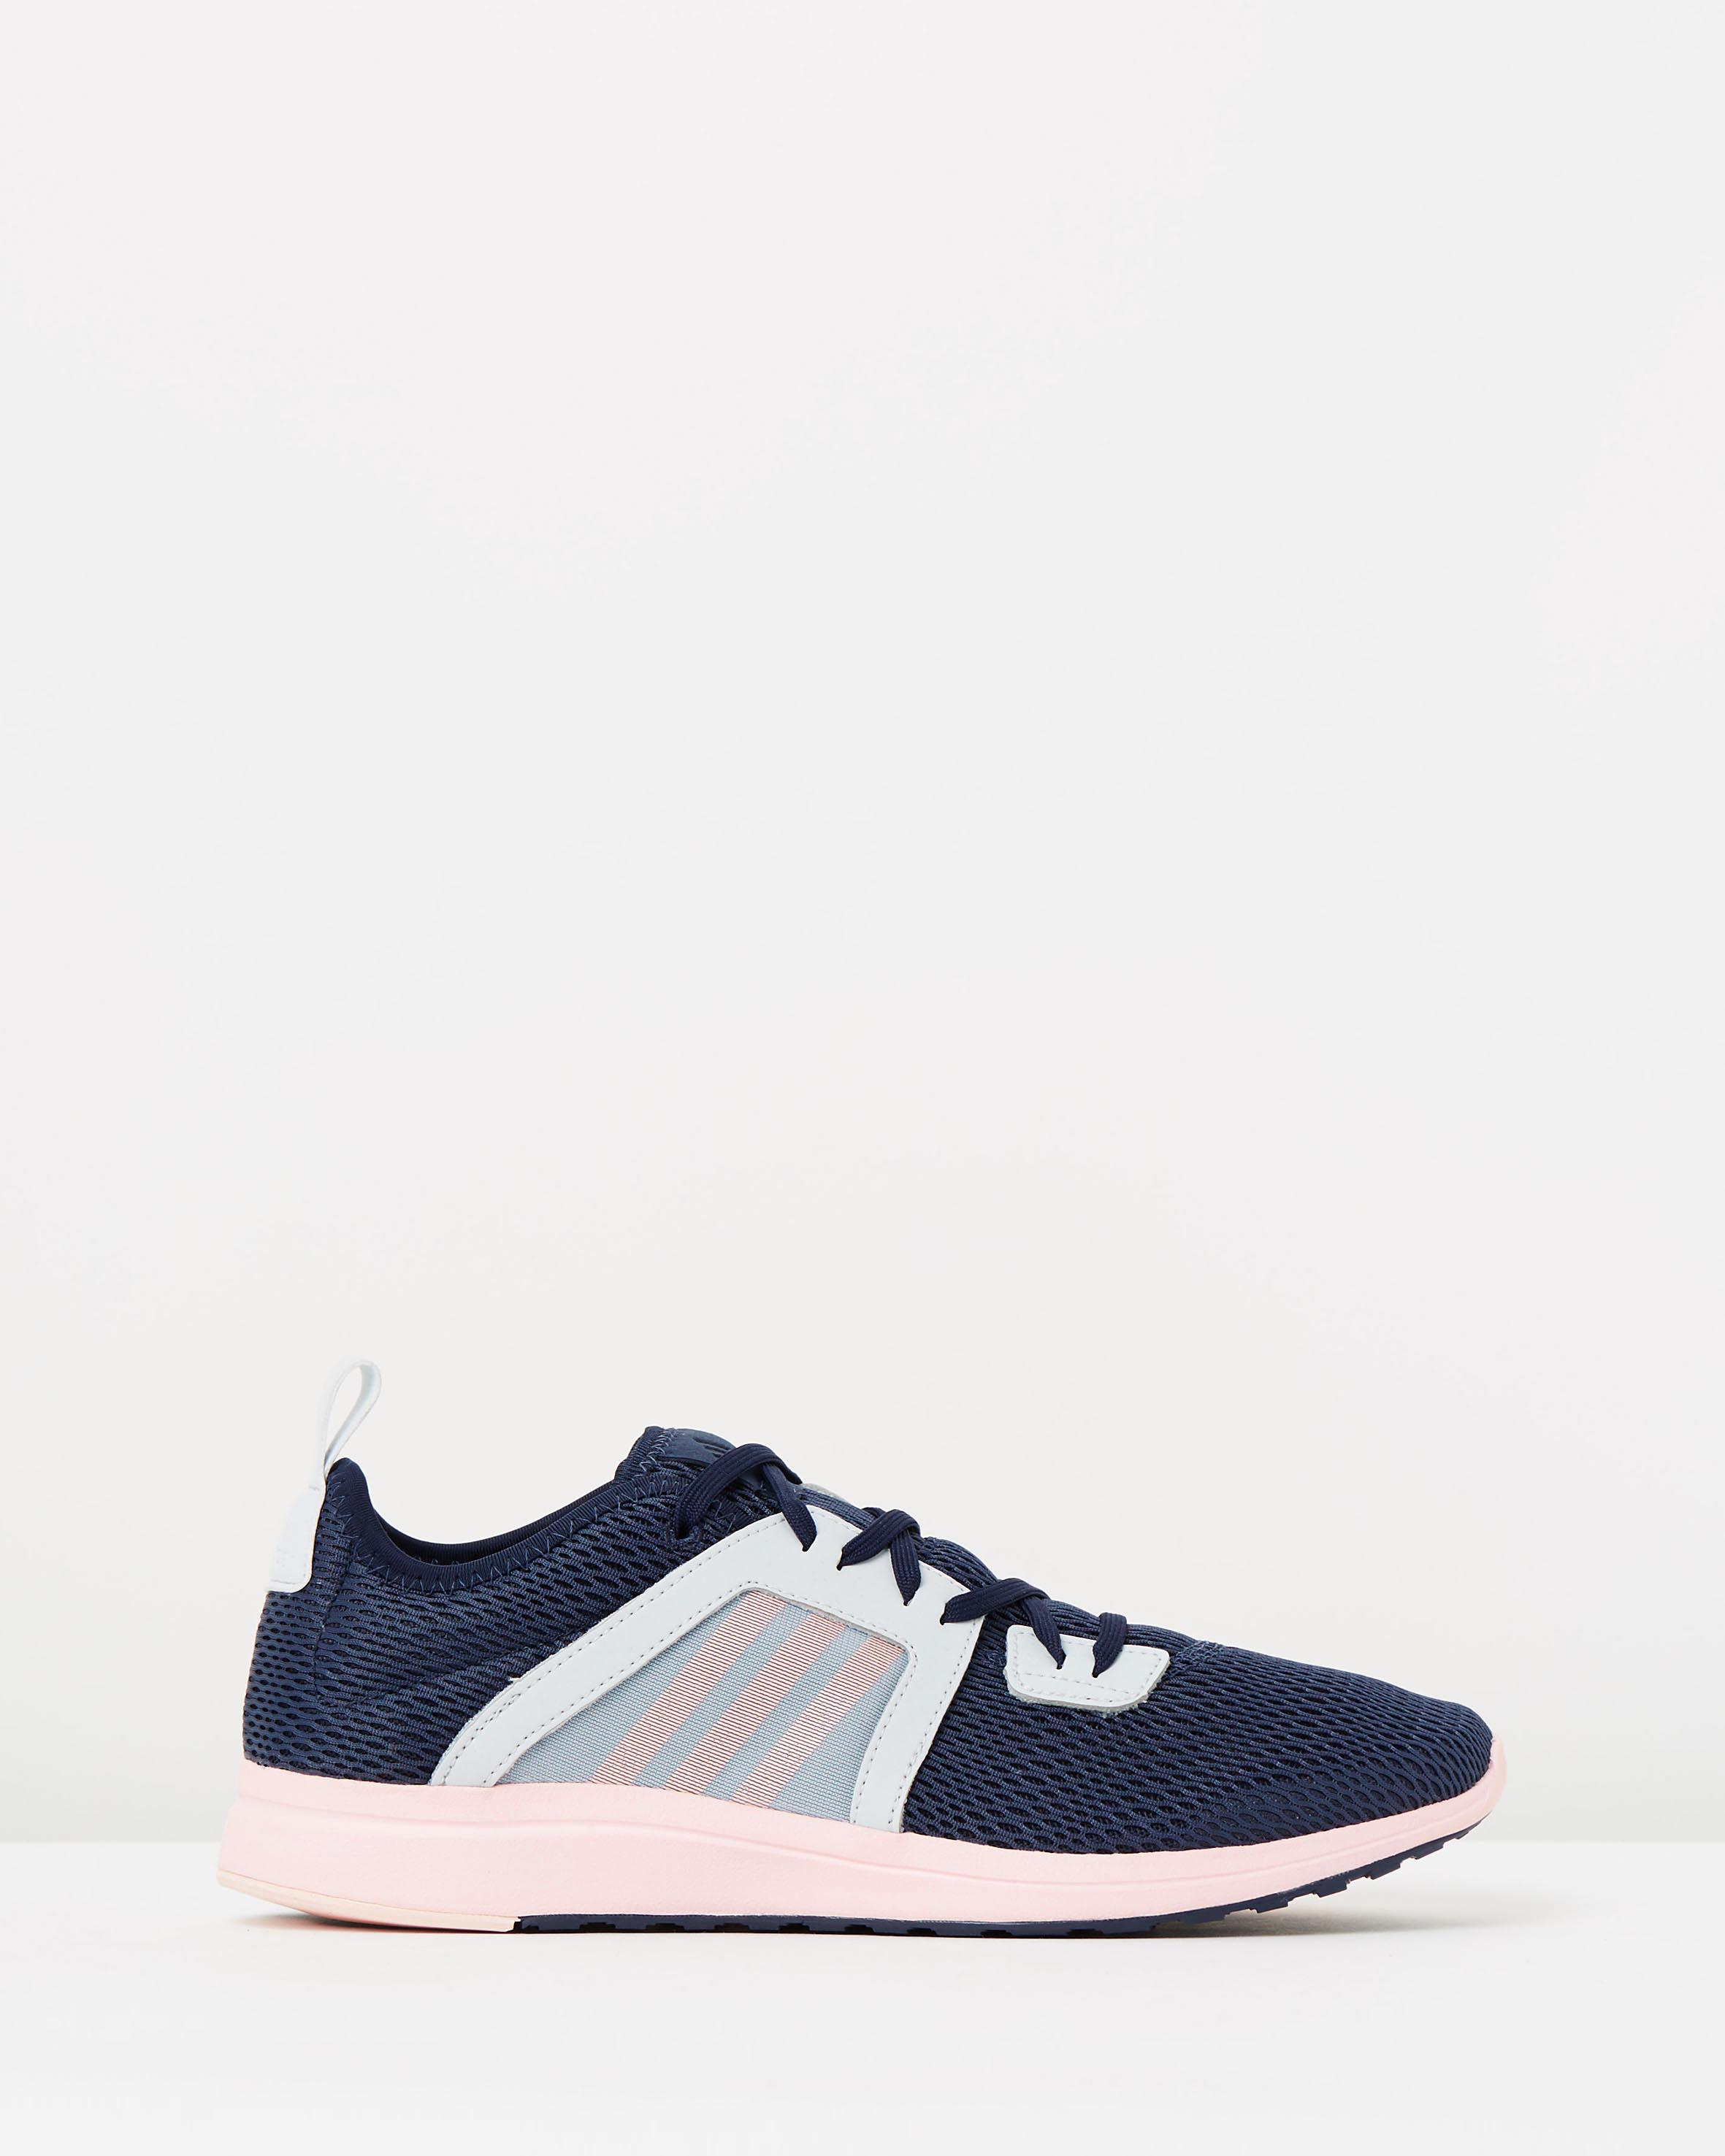 adidas supercloud womens running shoes